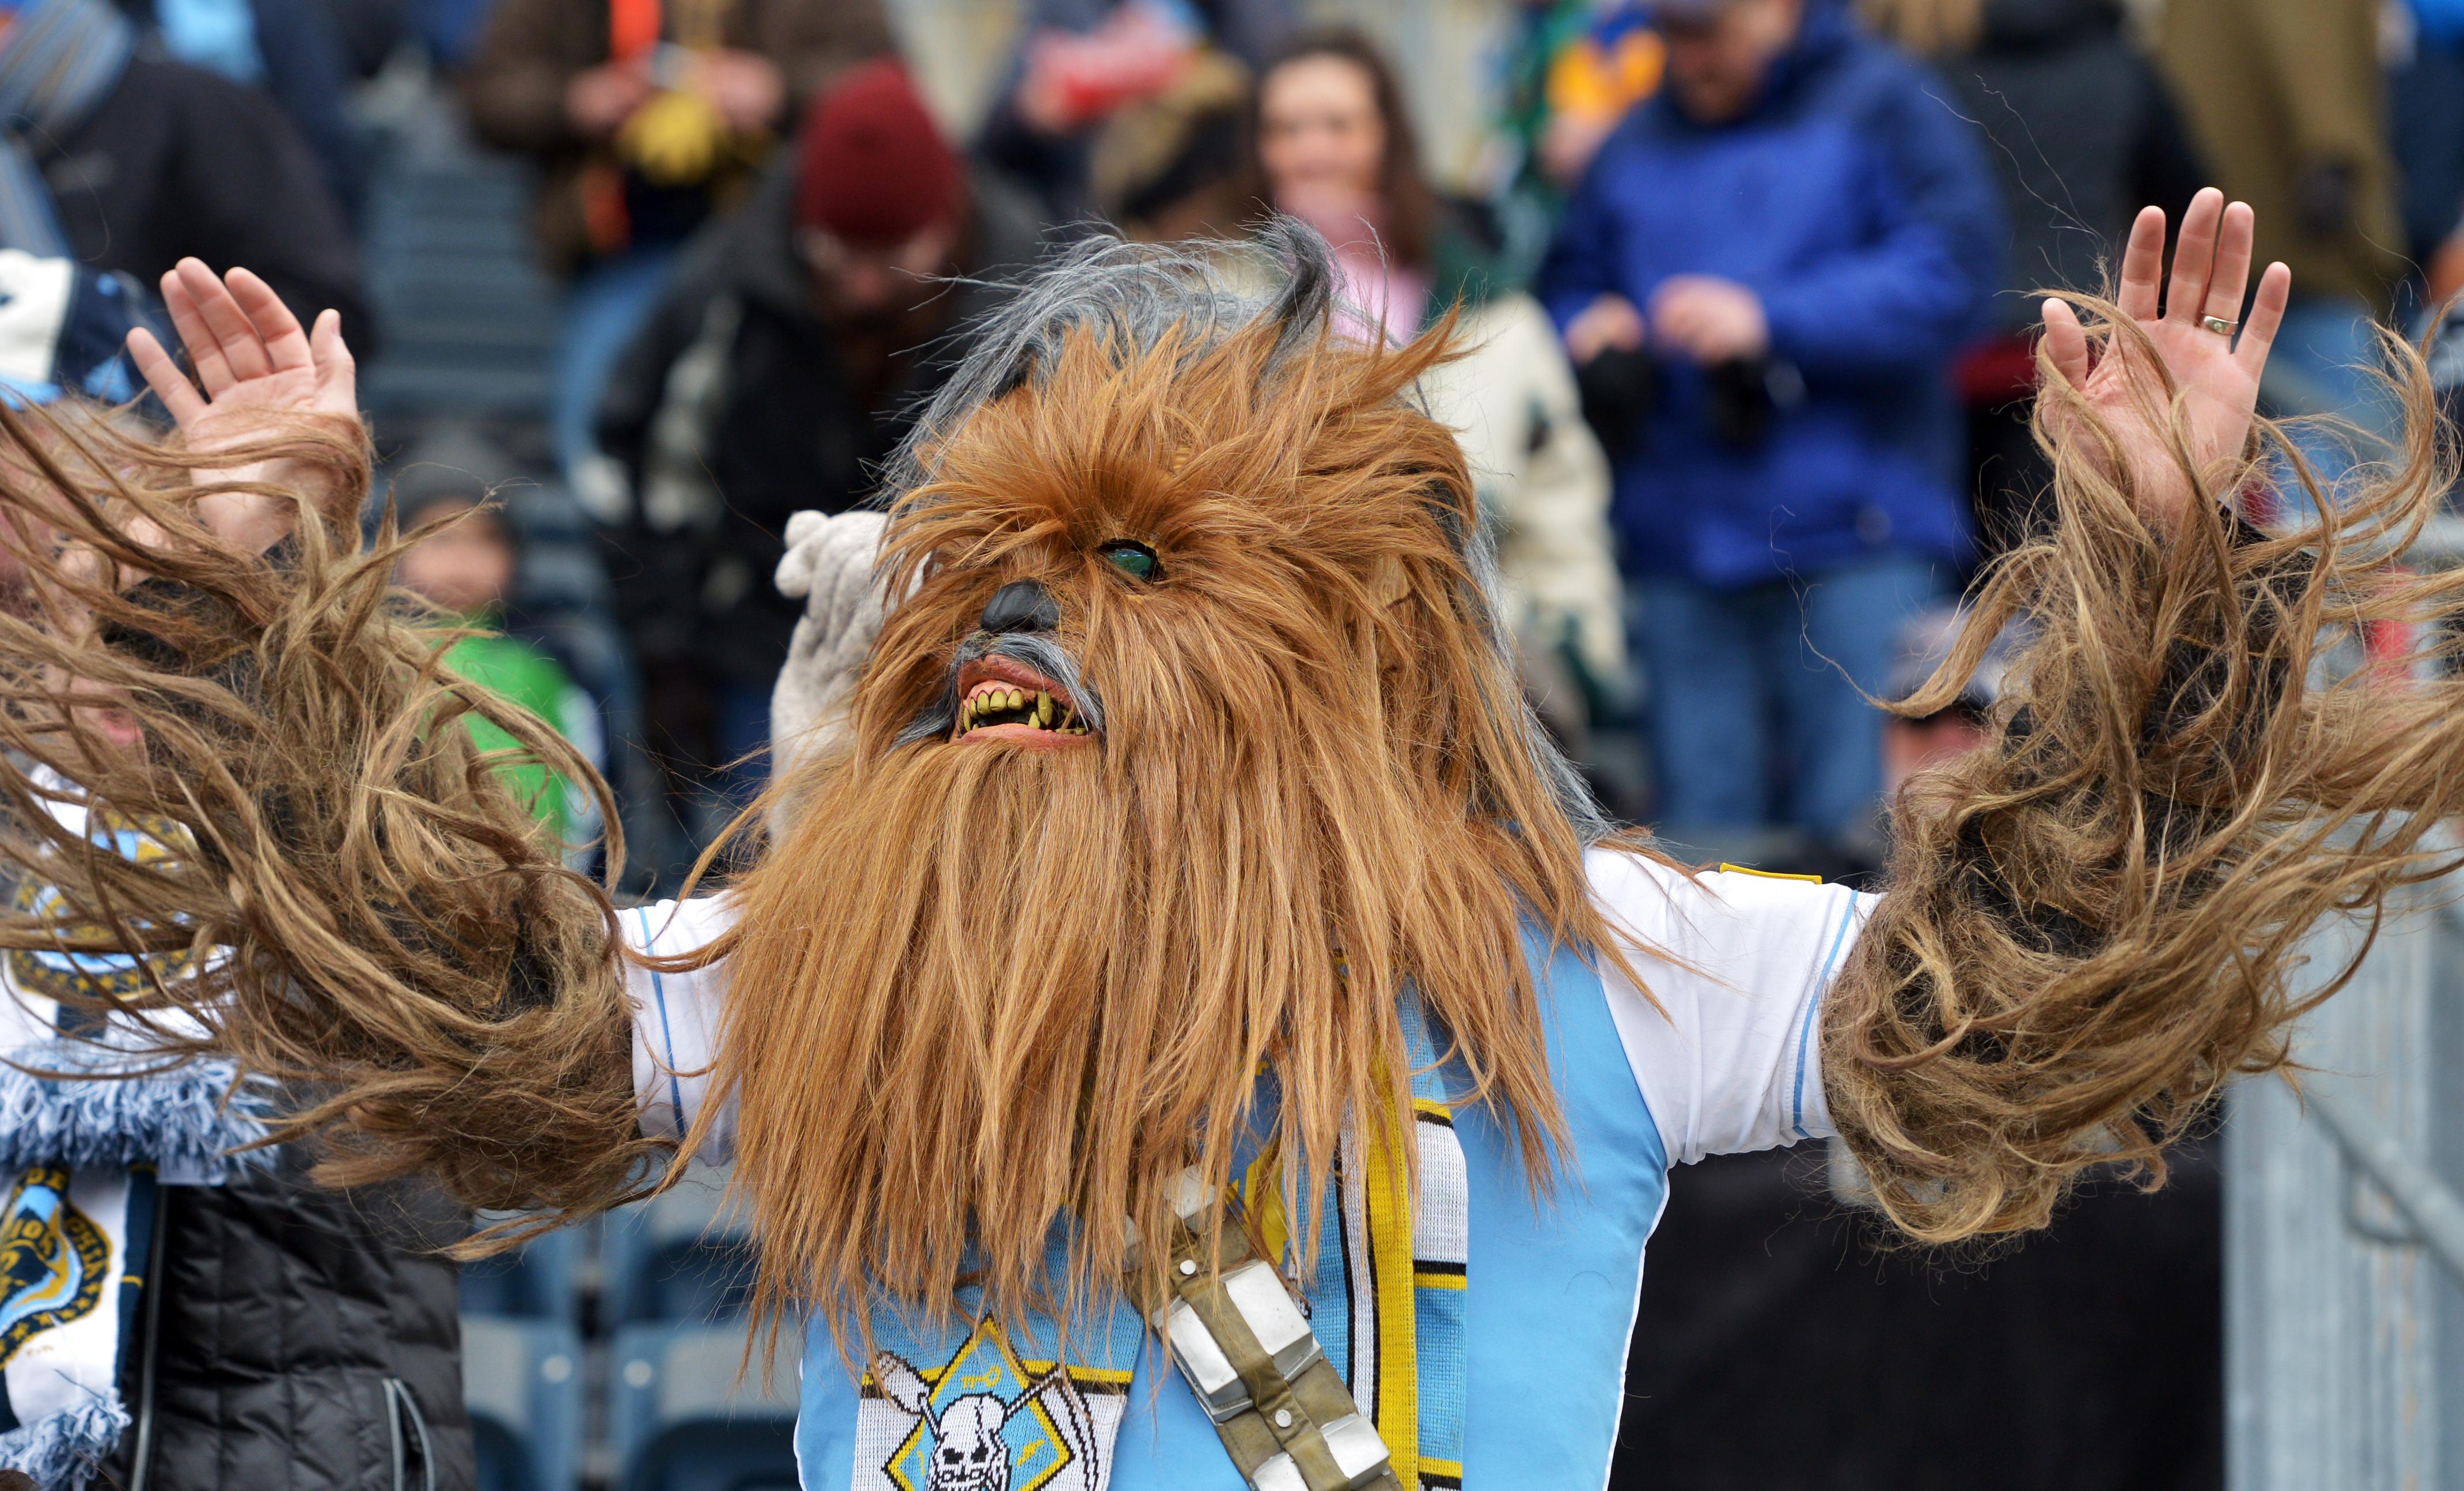 Chewbacca fan at a sporting event